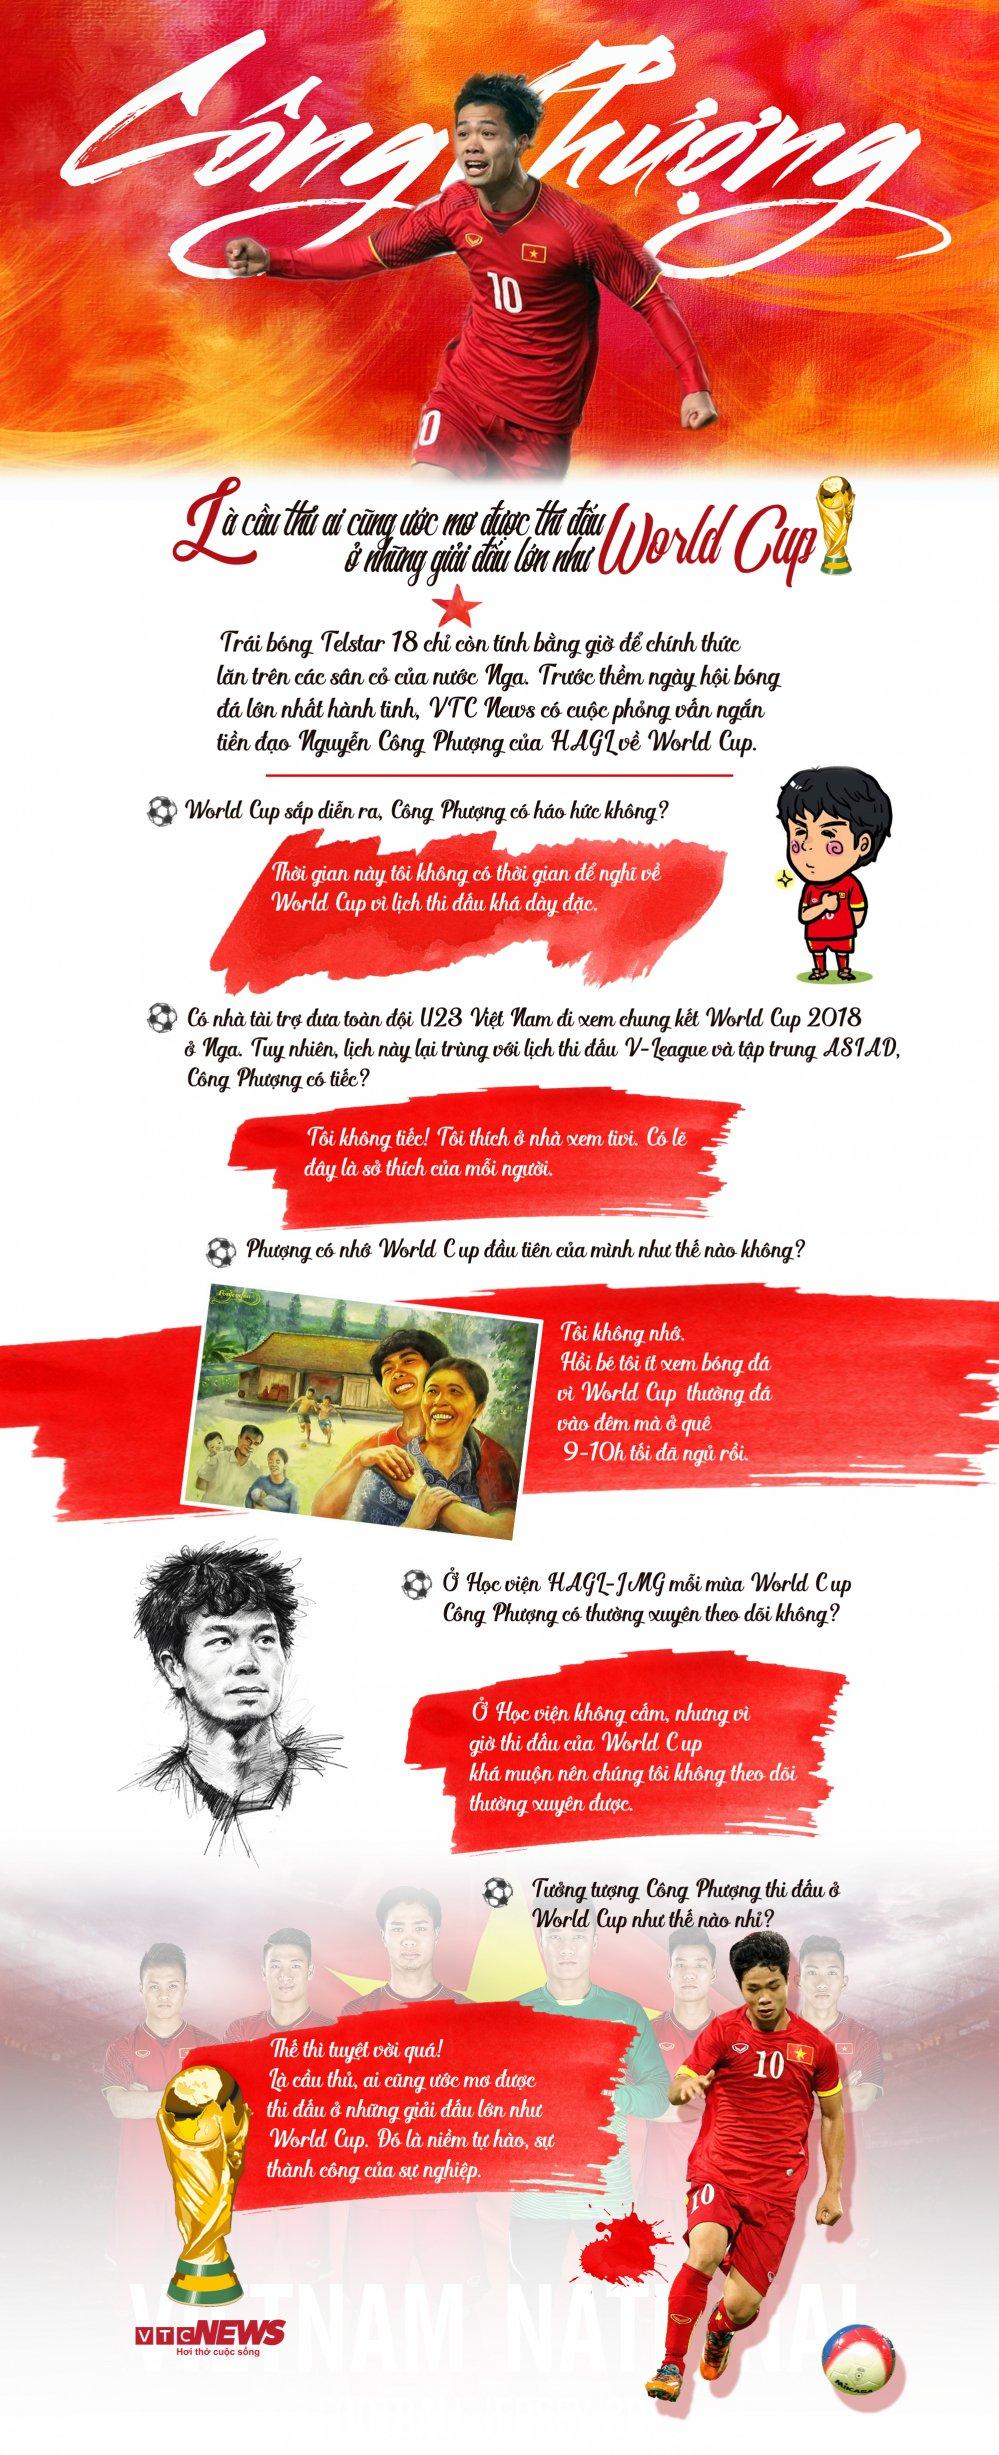 Cong Phuong: Thi dau o World Cup la uoc mo cua moi cau thu hinh anh 1